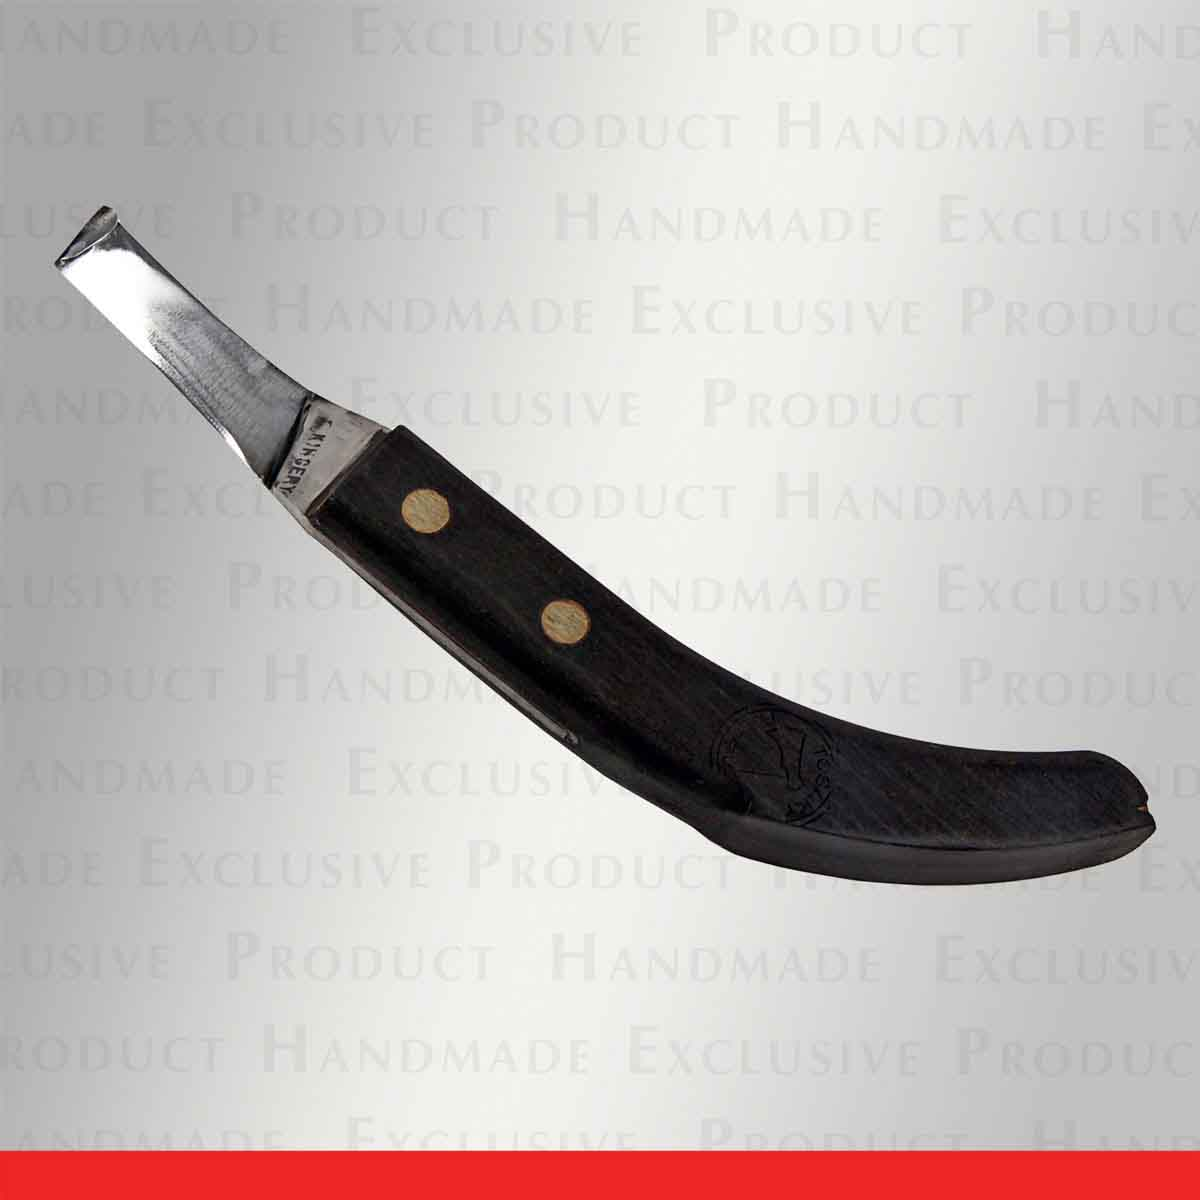 Kingery Straight & Curve Blades